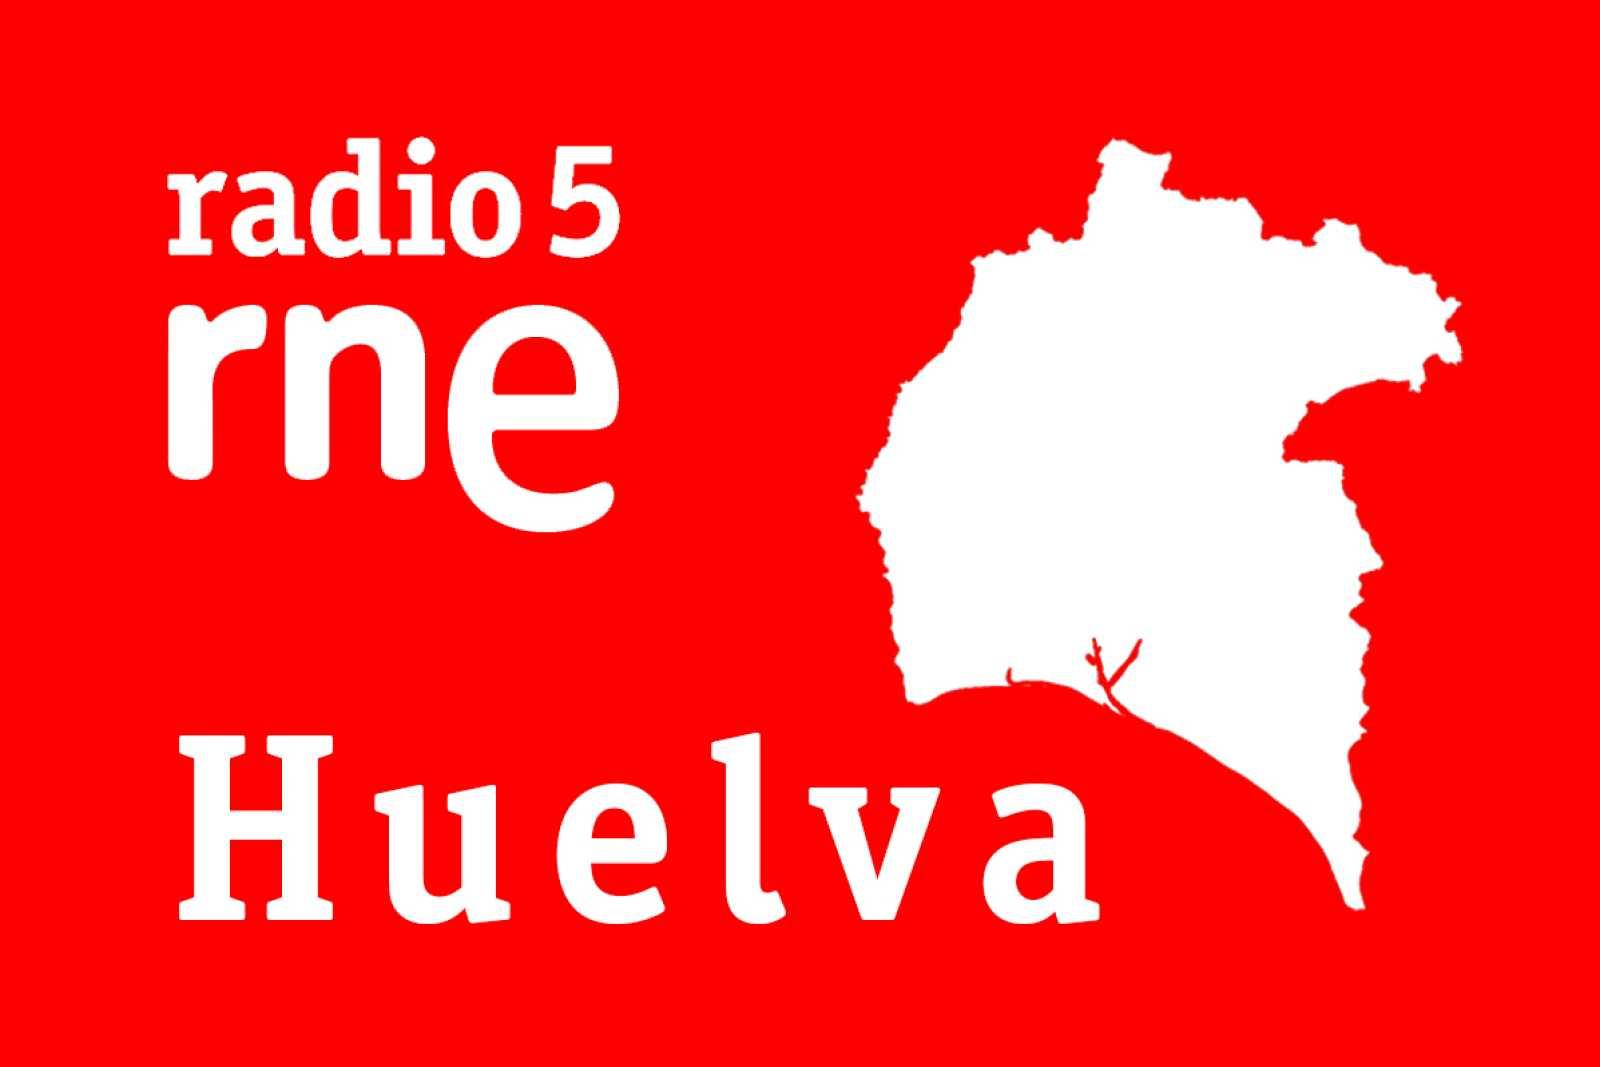 Informativo Huelva - 13/04/21 - Escuchar ahora.